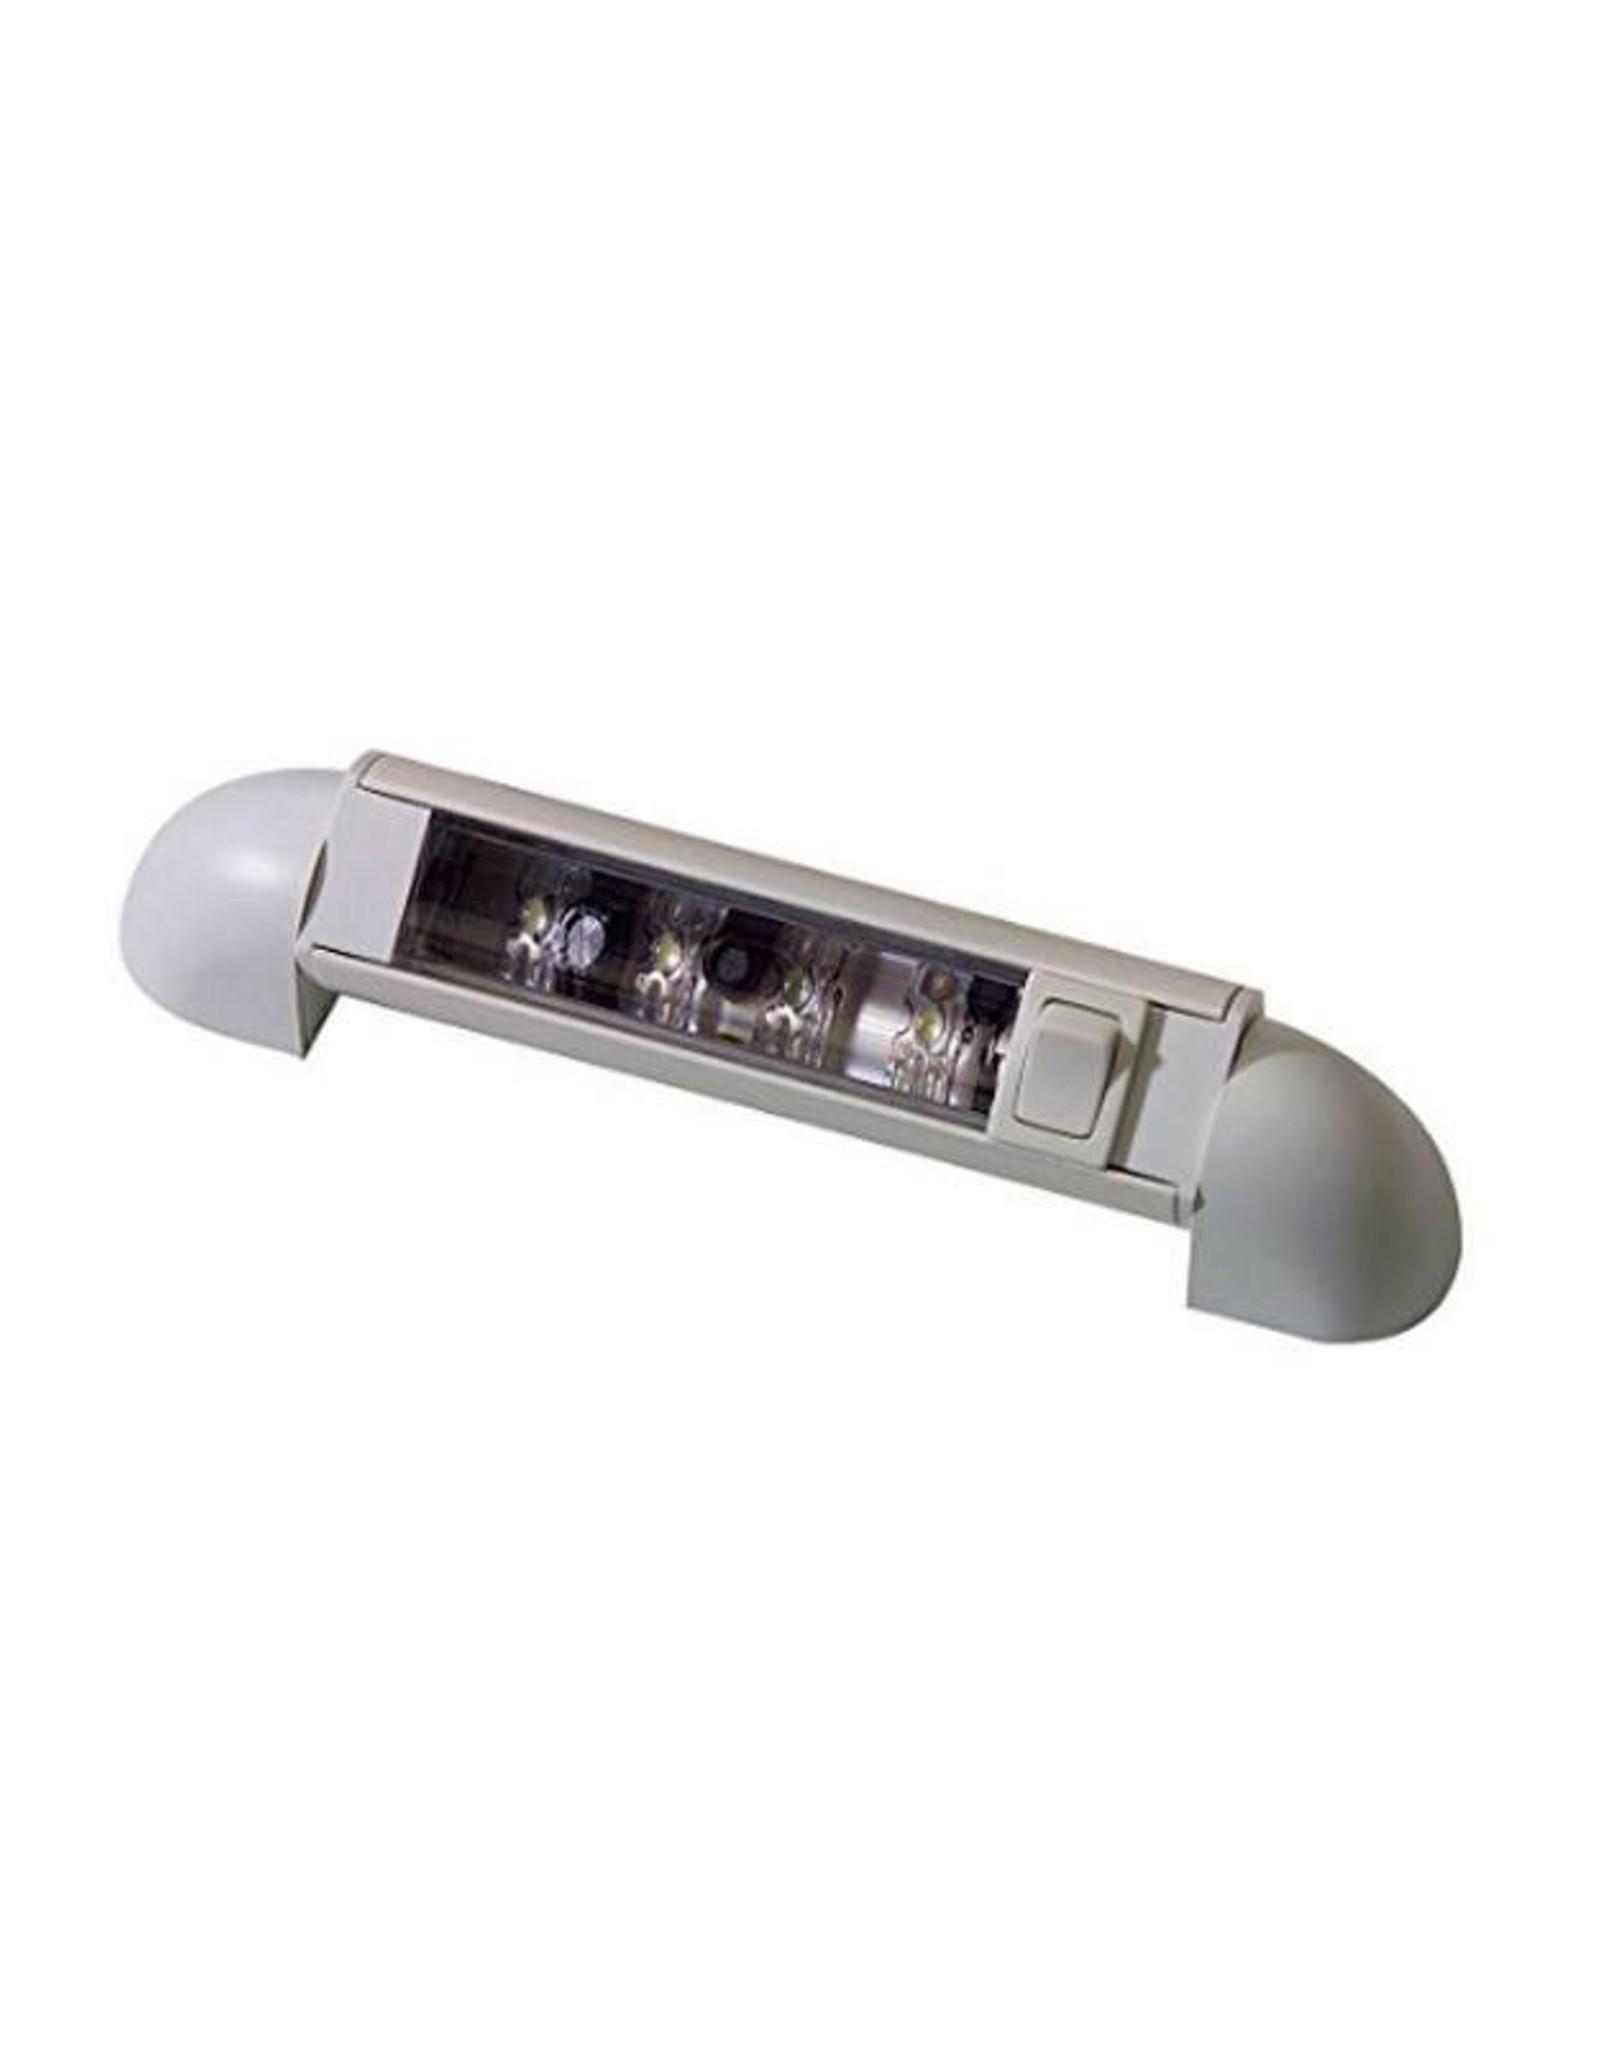 "LIGHT LEDBUNK WH/WH 7""X1.25"" INL018-5100-7"